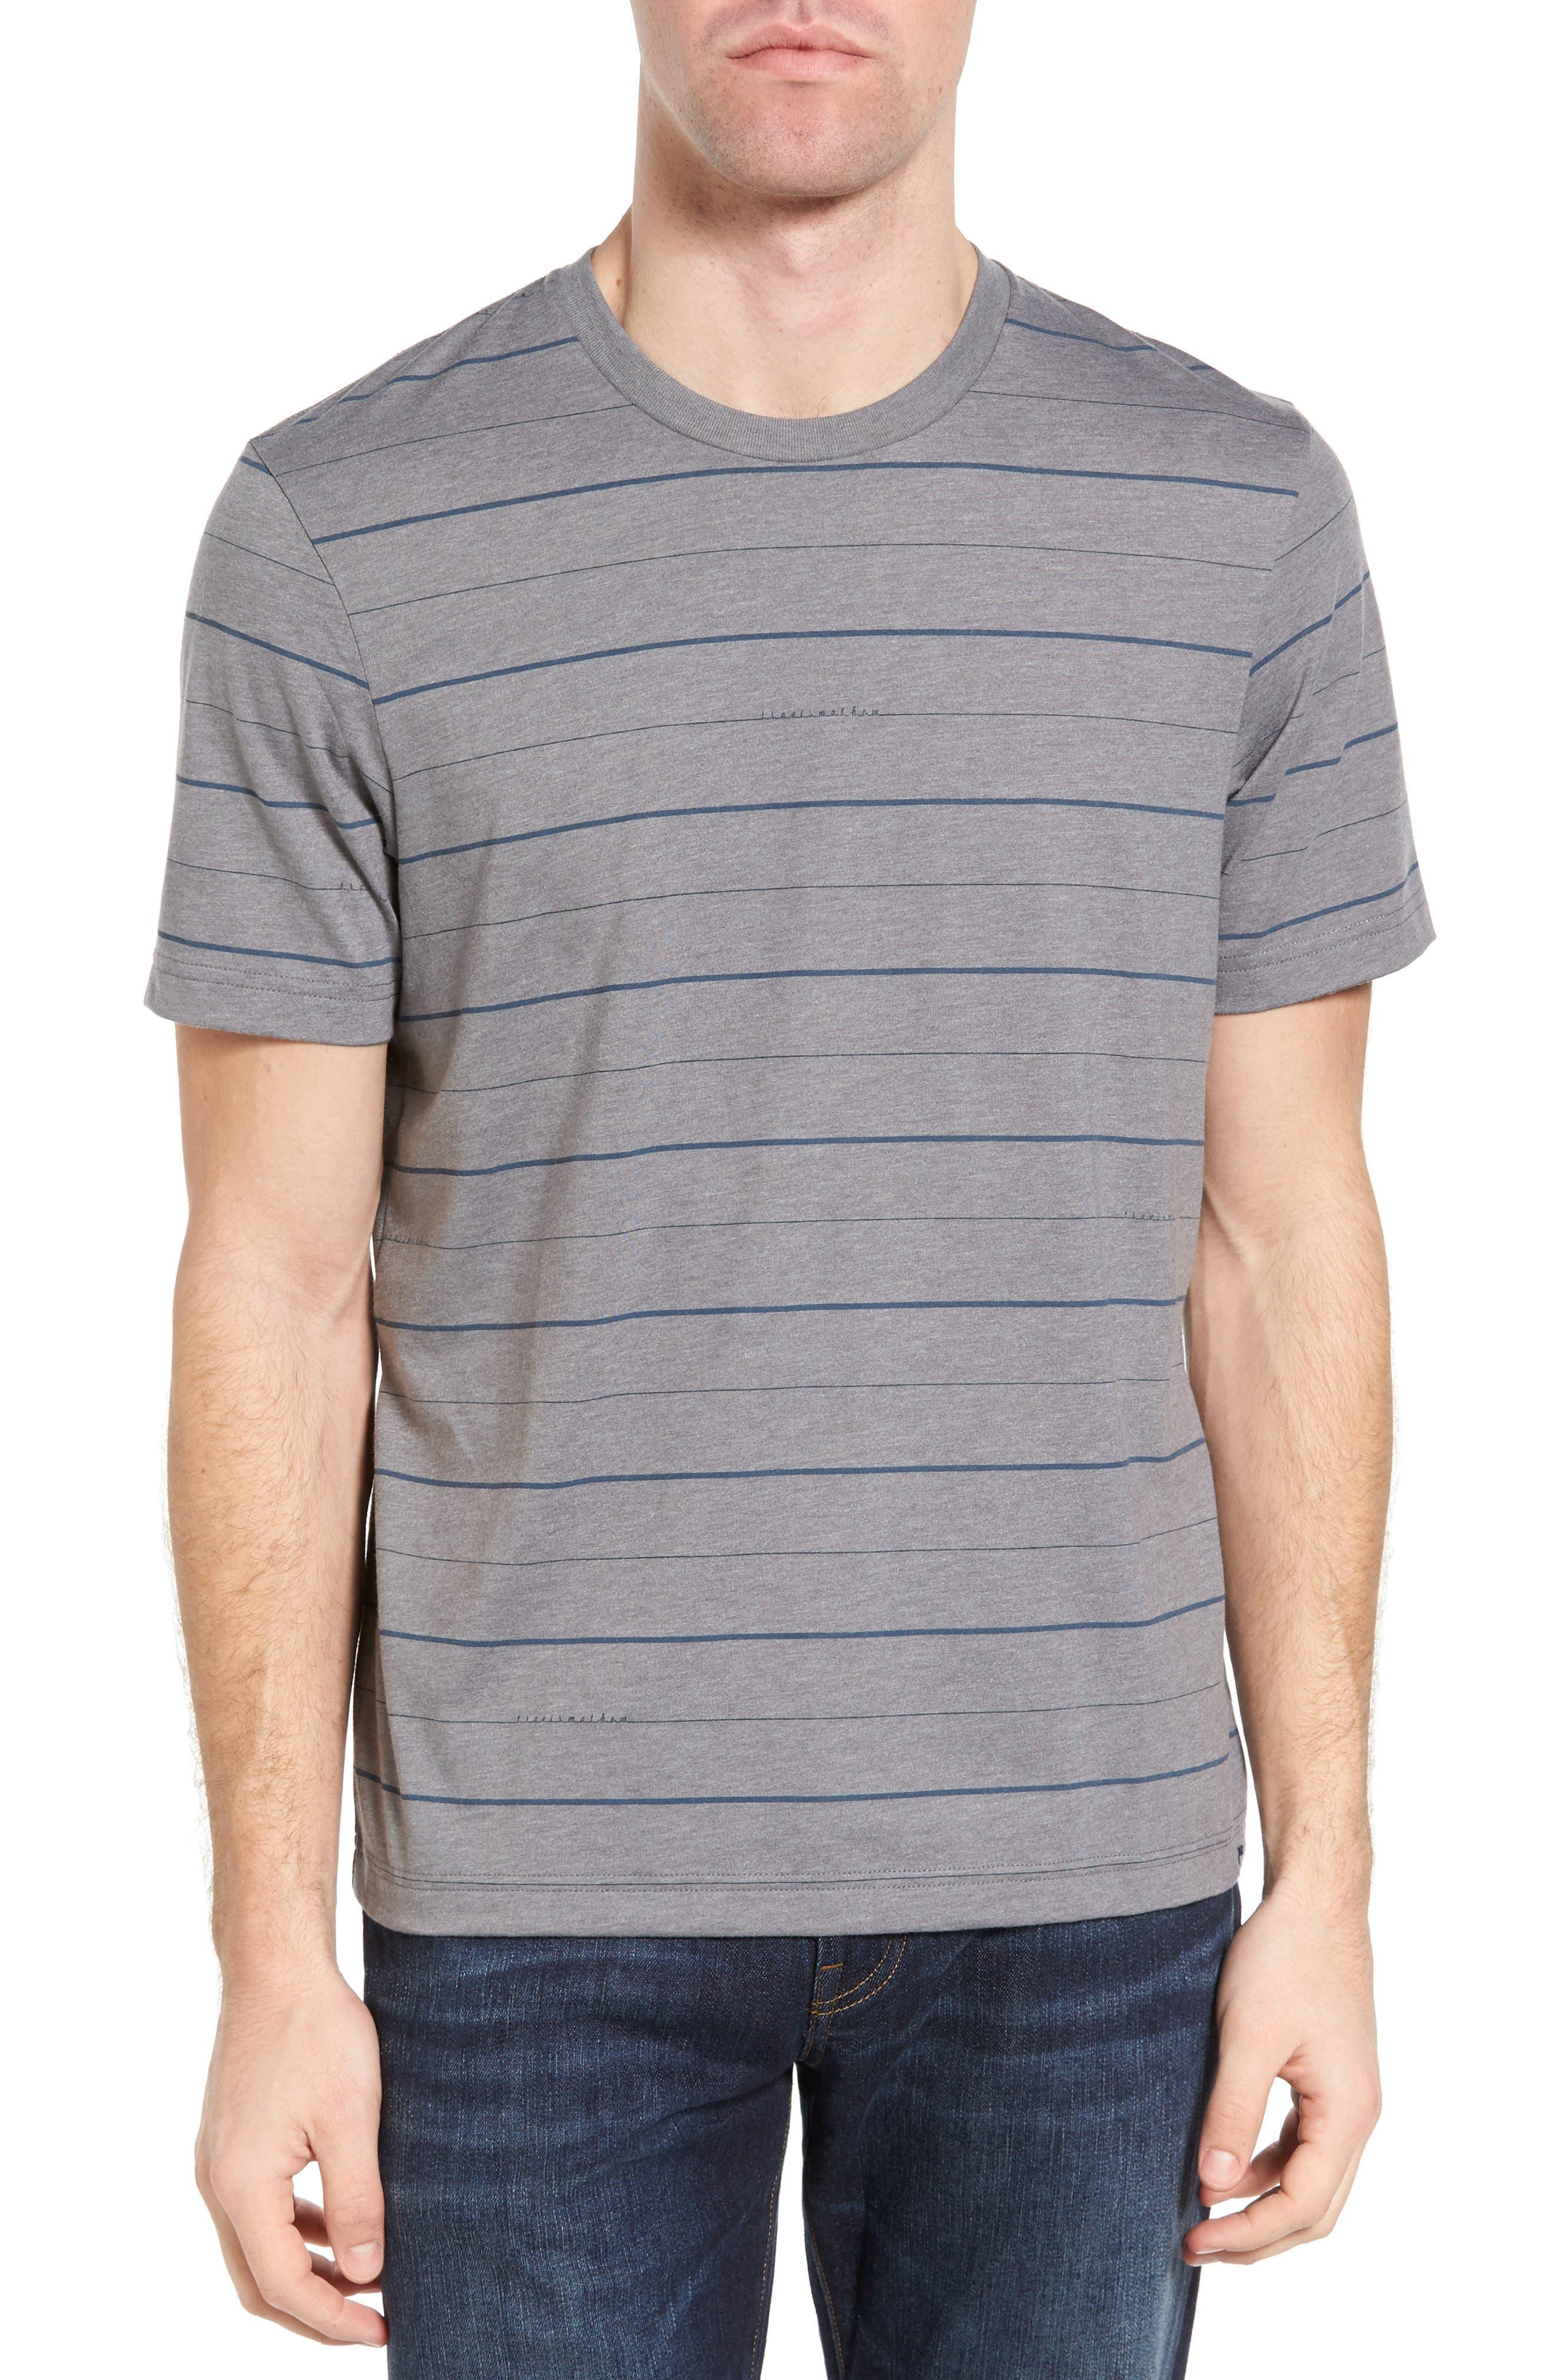 Hodapp T-Shirt,                             Main thumbnail 1, color,                             020